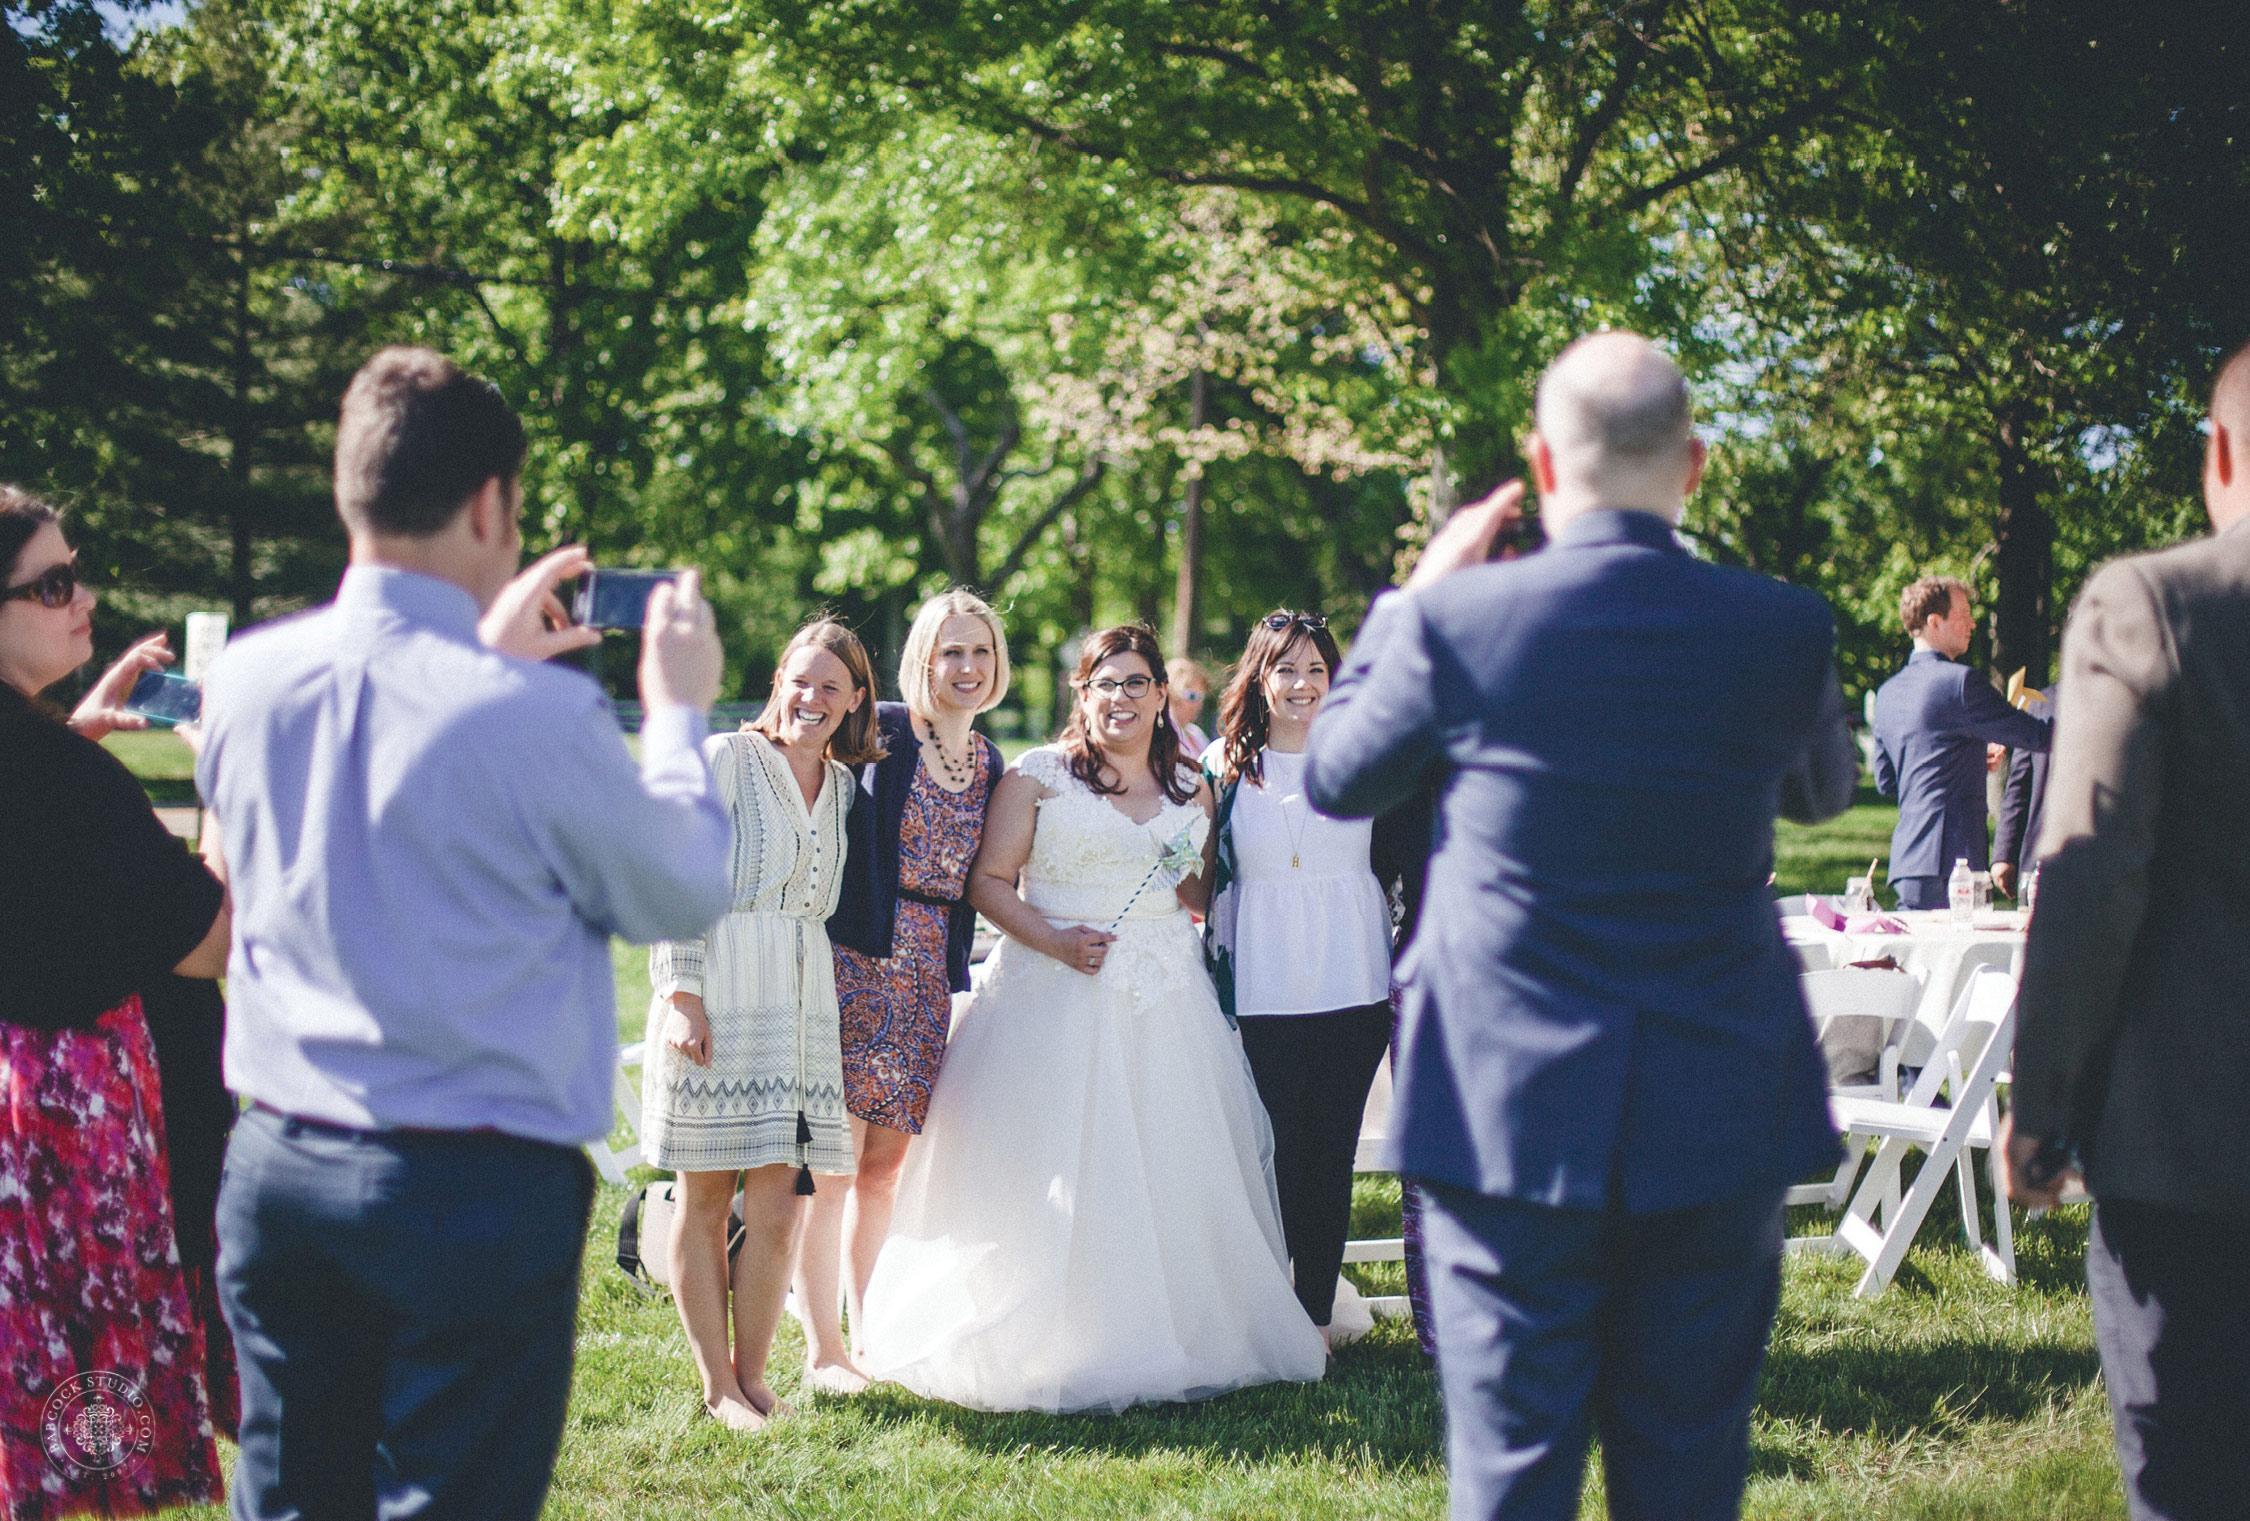 nicole-brendarn-school-house-wedding-photographer-dayton-ohio-24.jpg